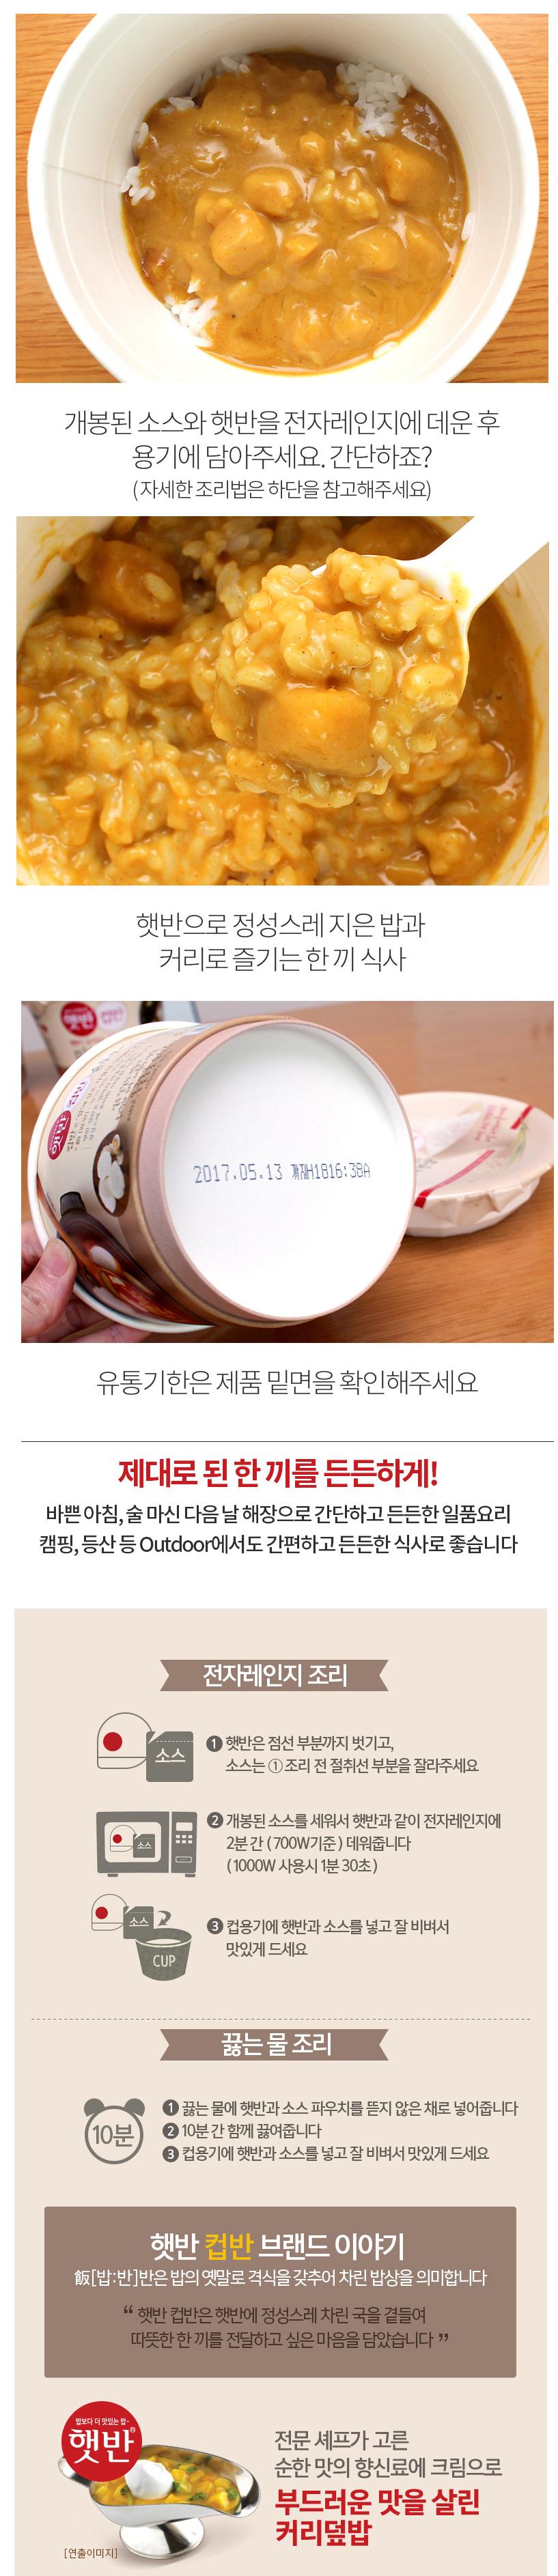 CJ Cooked White Rice with Yellow Cream Curry 9.8oz(270g), CJ 햇반 컵반 옐로우크림커리덮밥 9.8oz(280g)